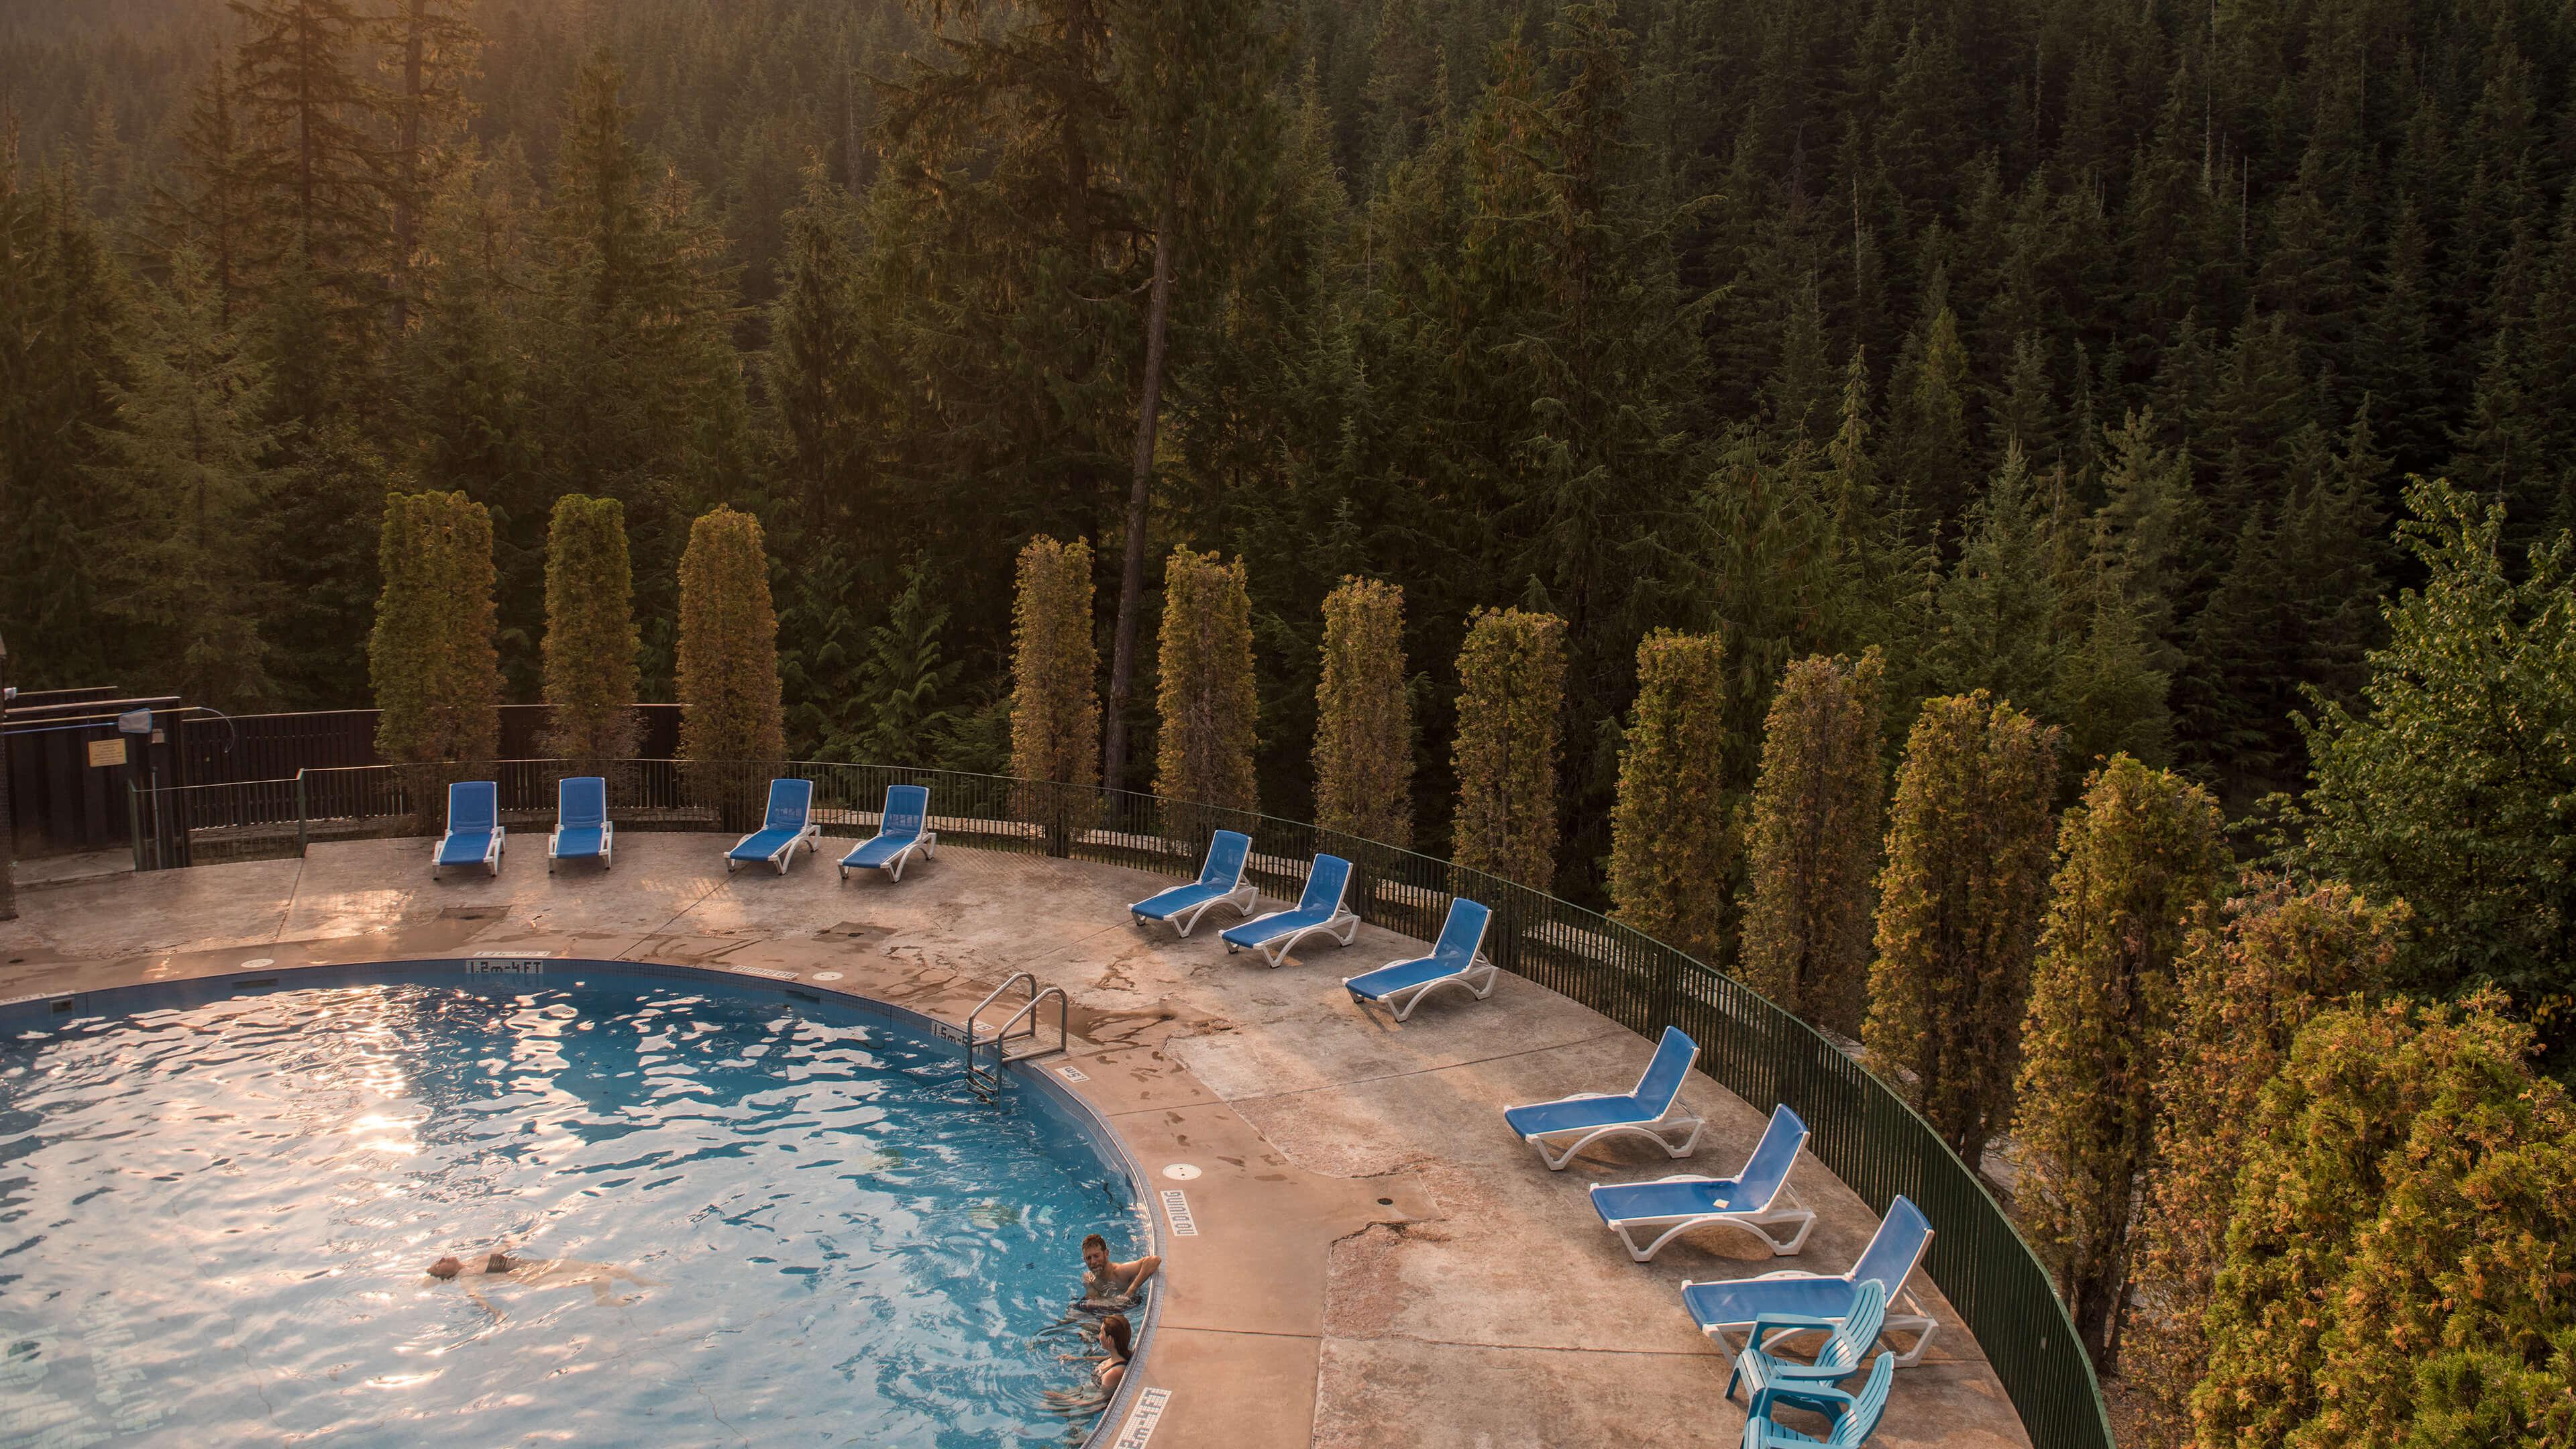 Nakusp Hot Springs in BC's Kootenay Rockies